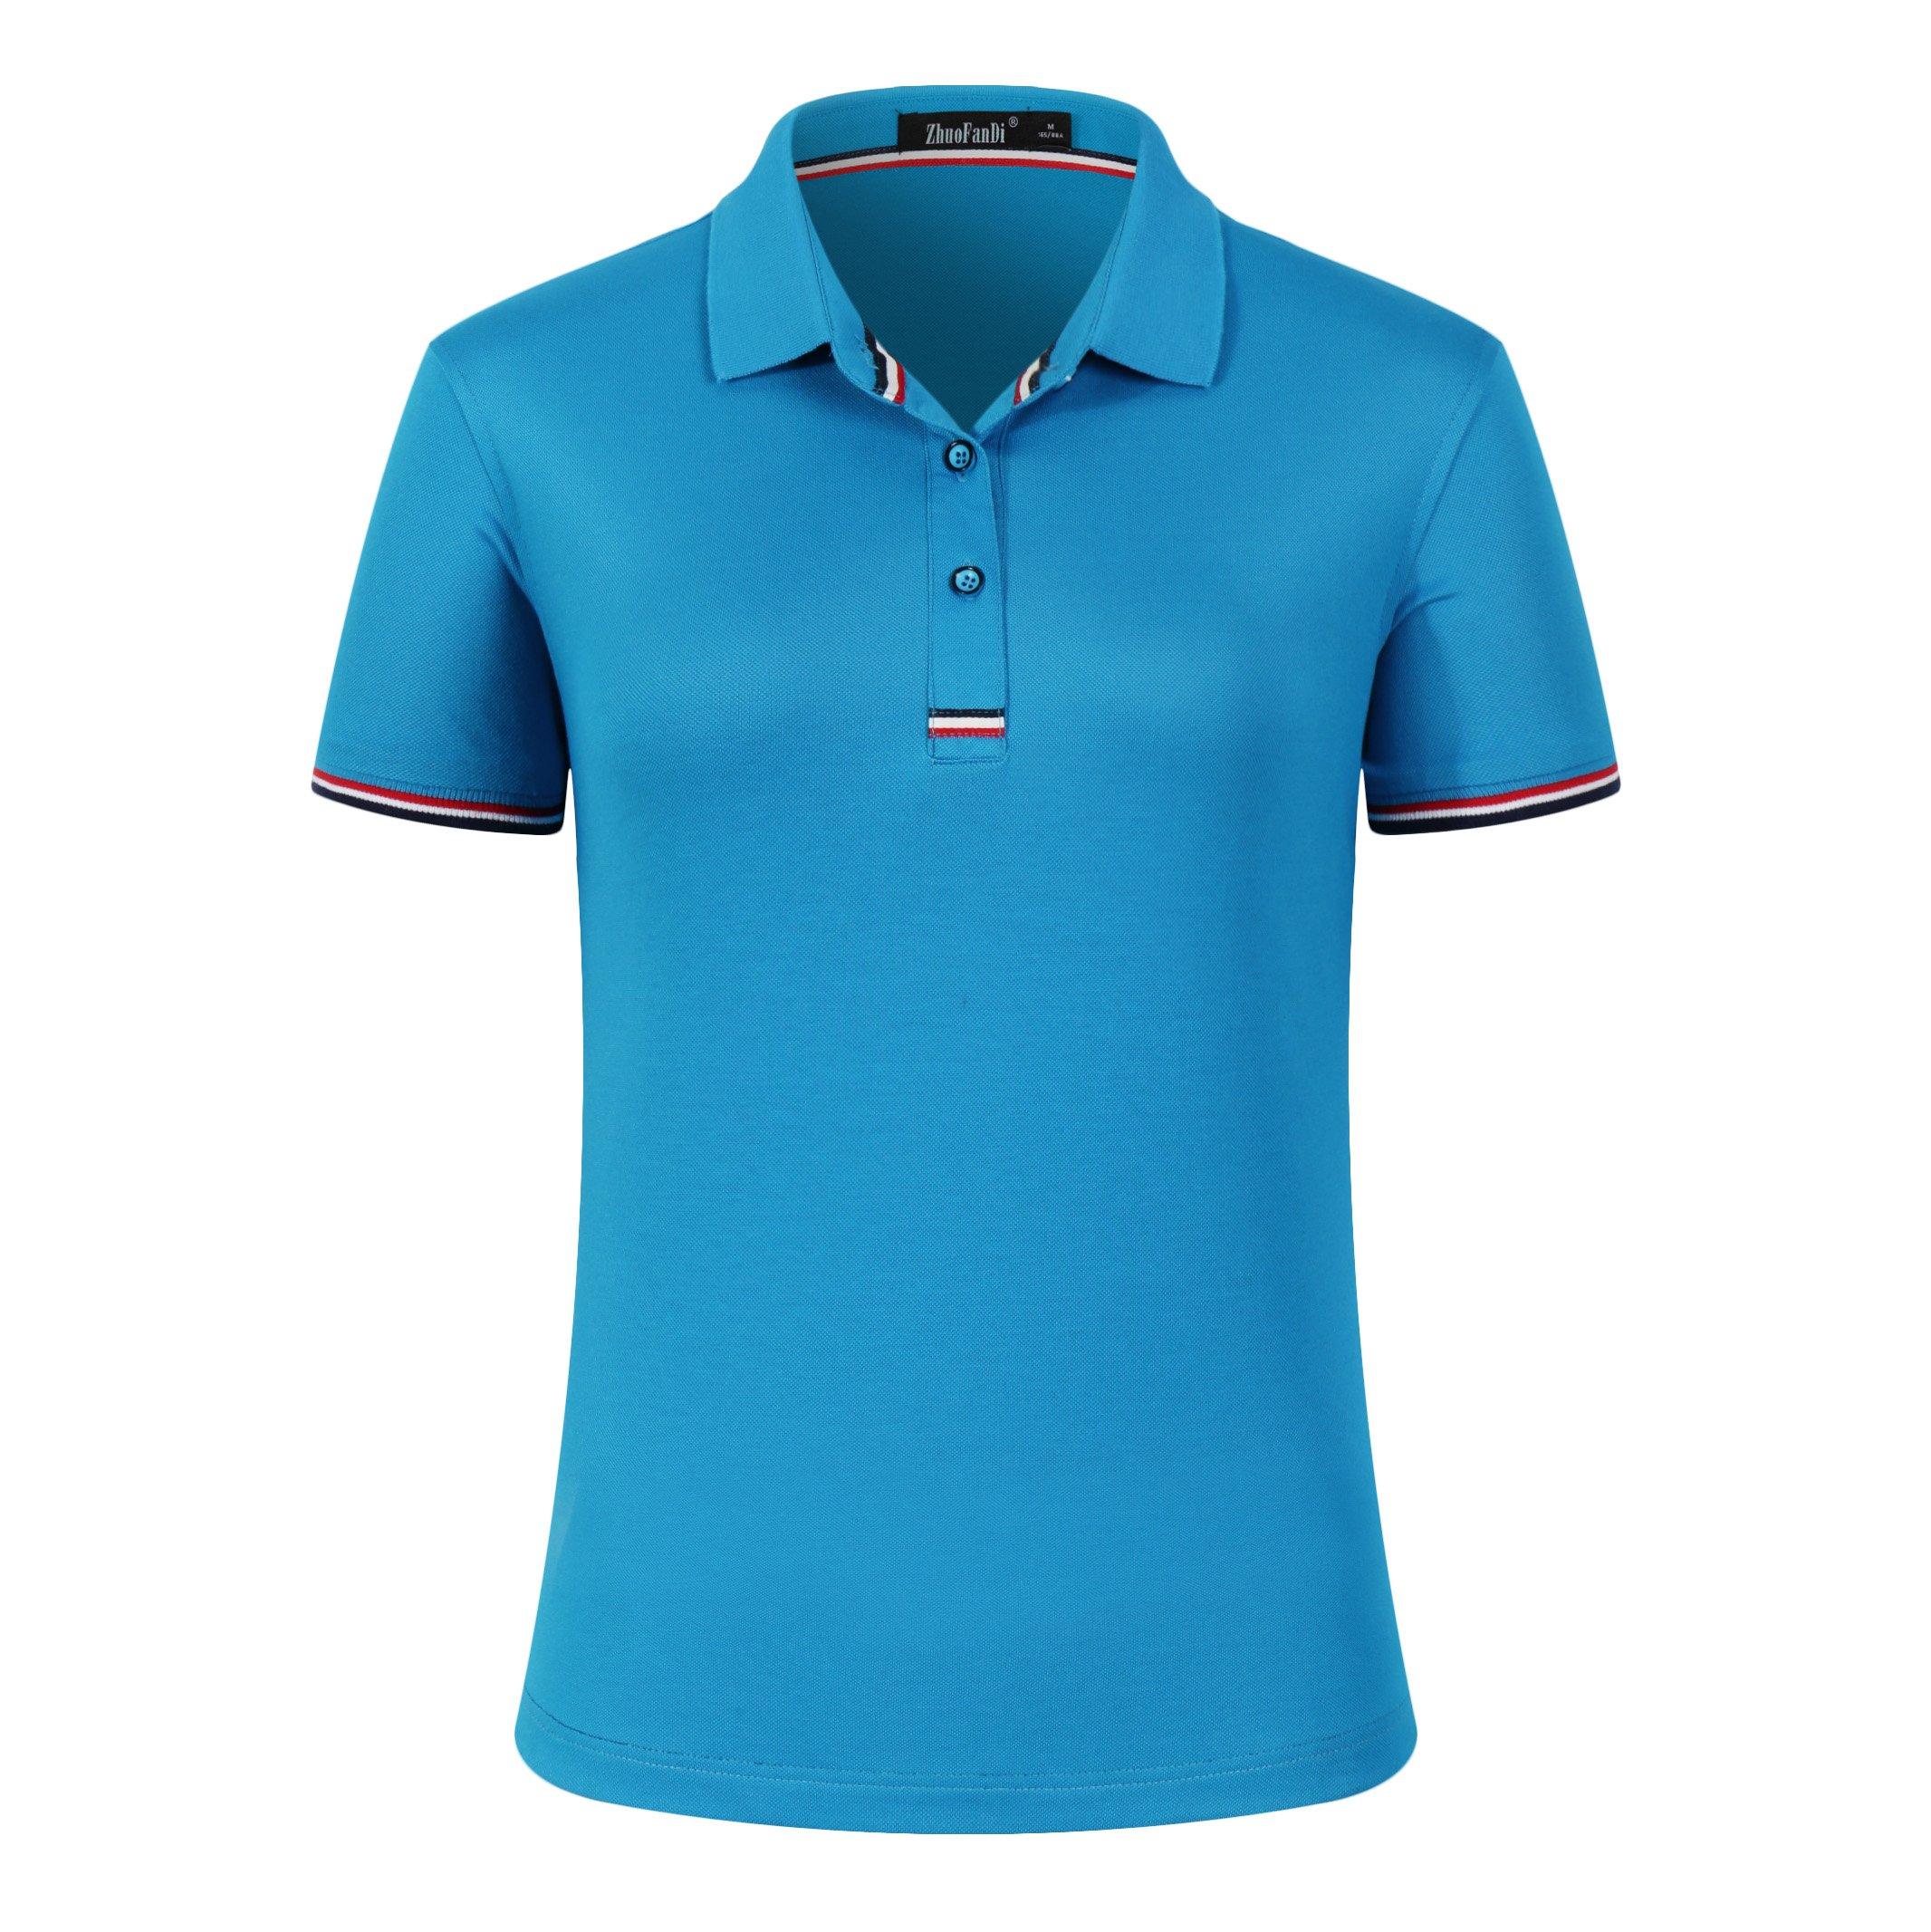 Mitario Femiego Women Classic Striped Collar Slim Fit Short Golf Polo Shirt Blue S